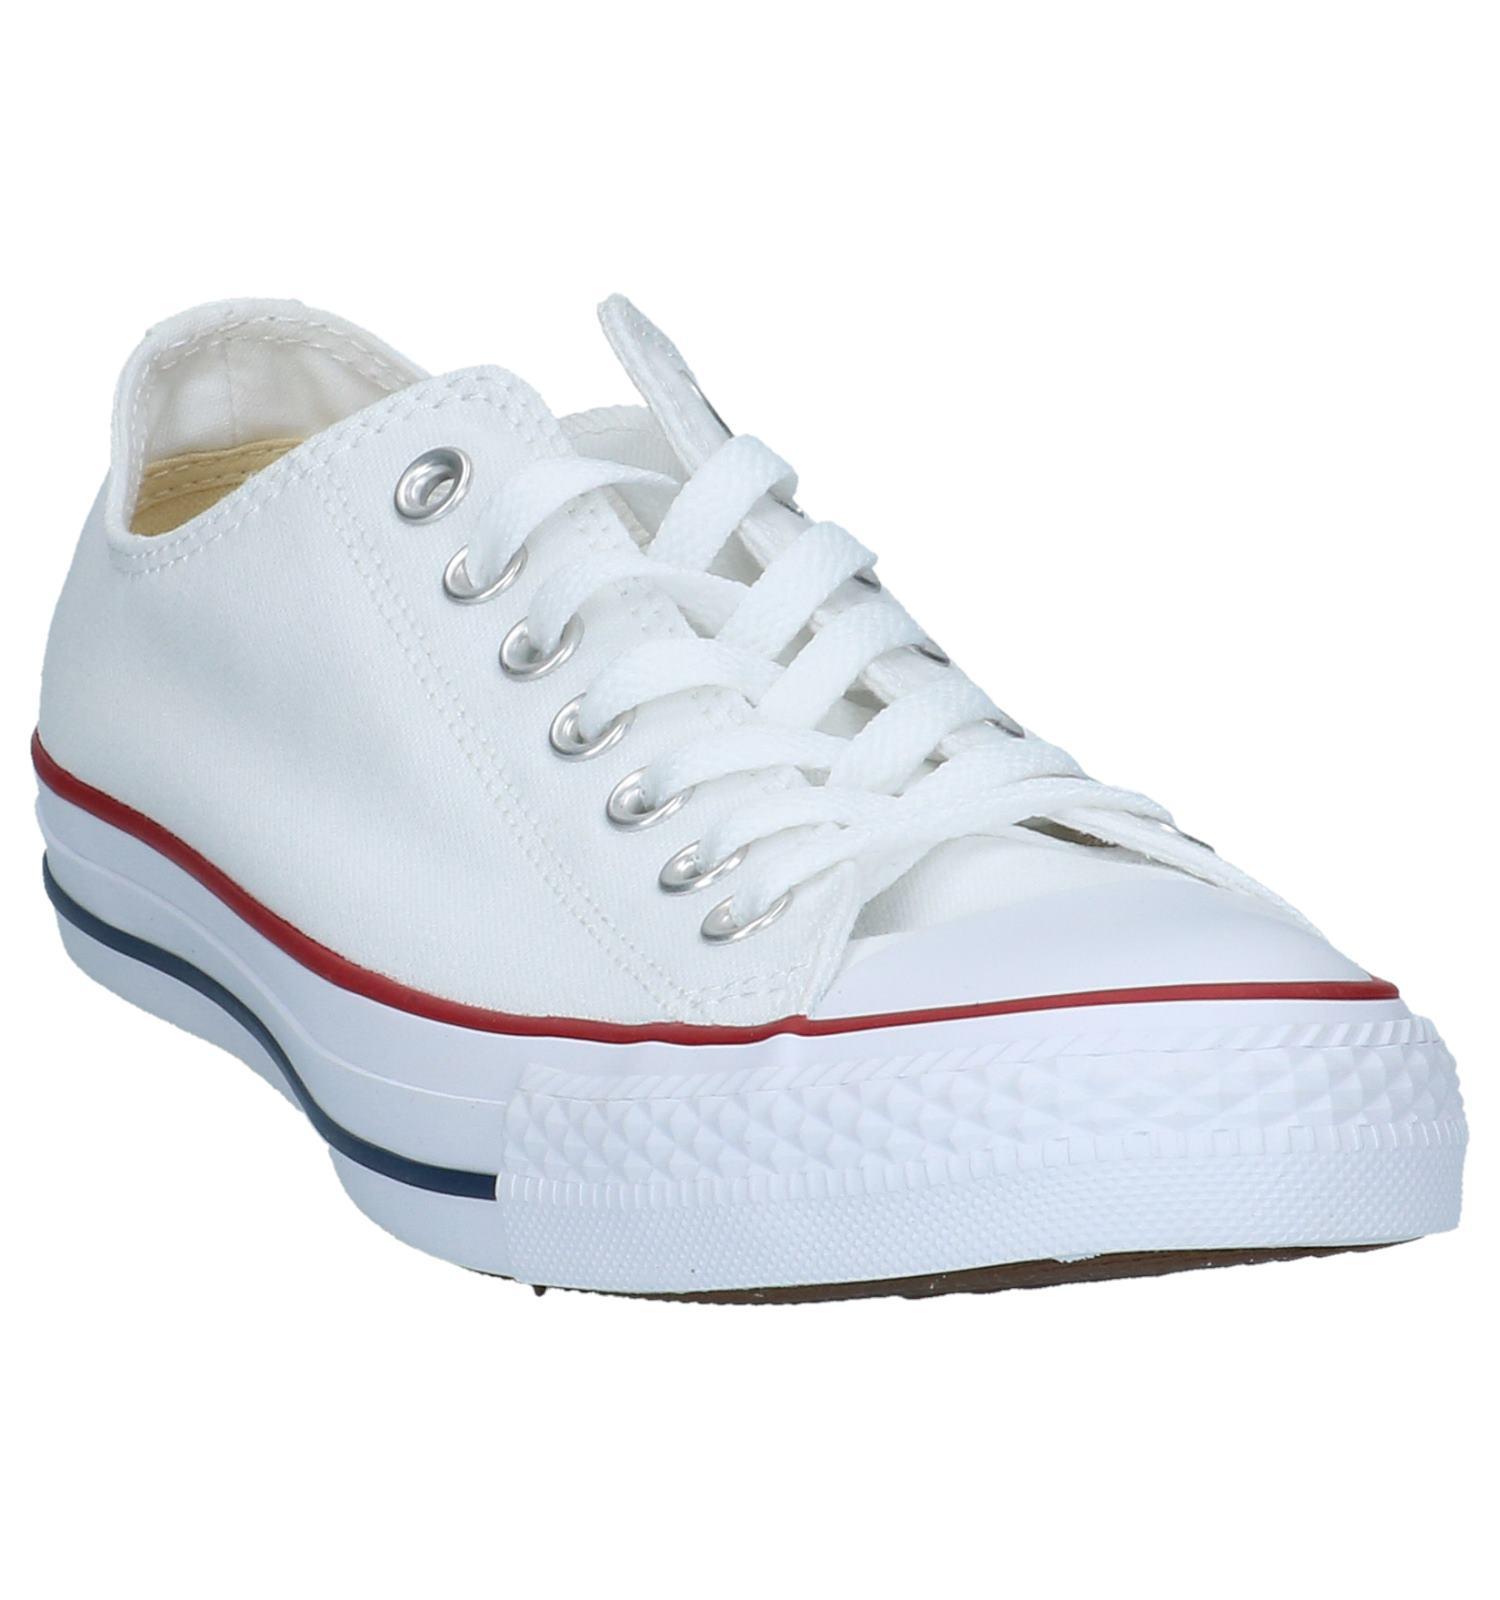 Converse All Star Core OX Witte Sneakers   SCHOENENTORFS.NL